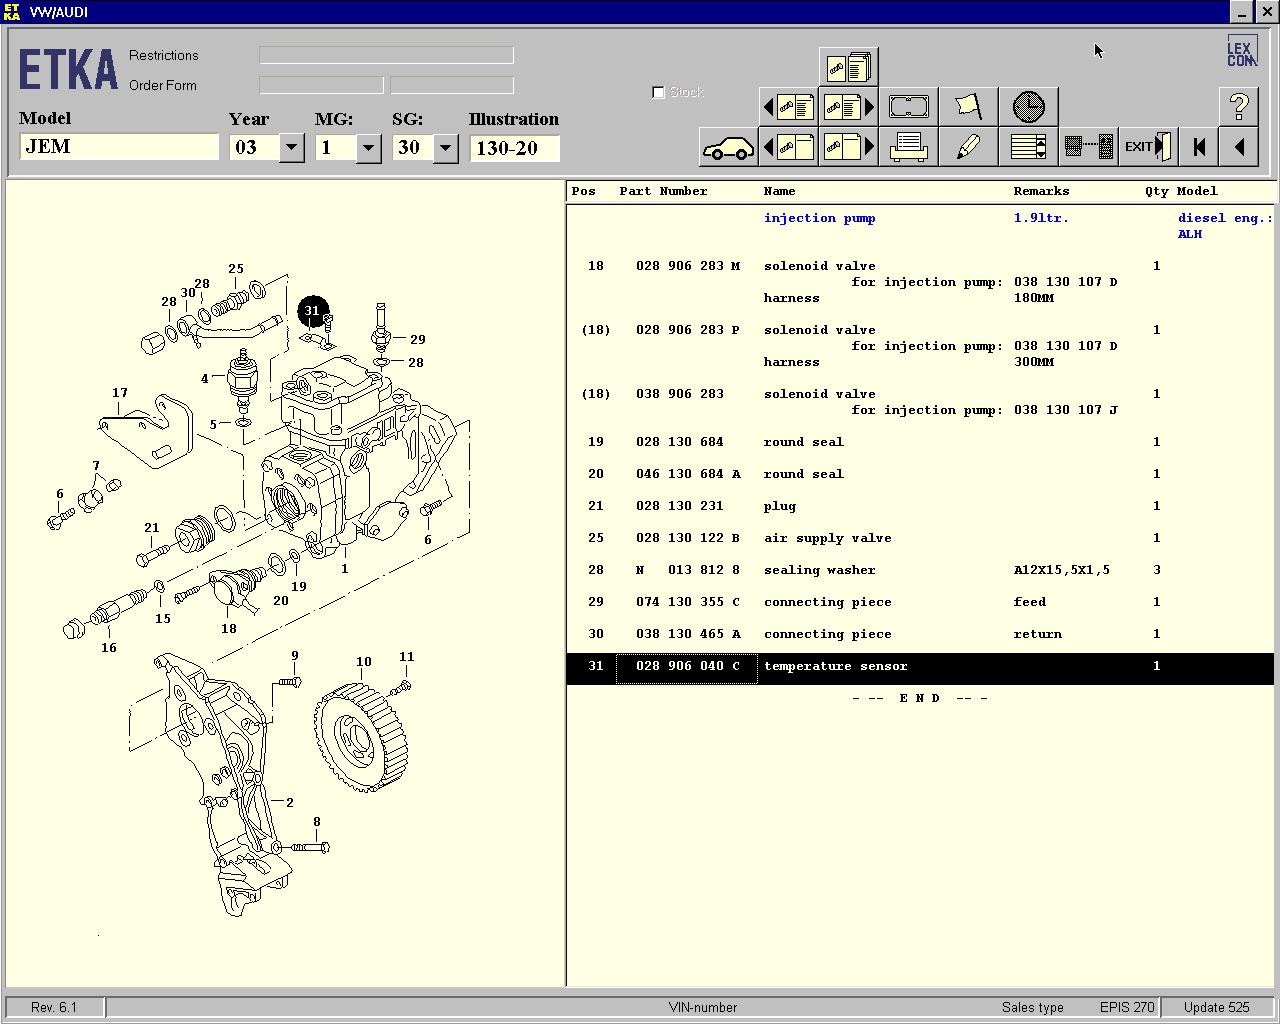 Fuel Temp Sensor Repair Procedure Tdiclub Forums